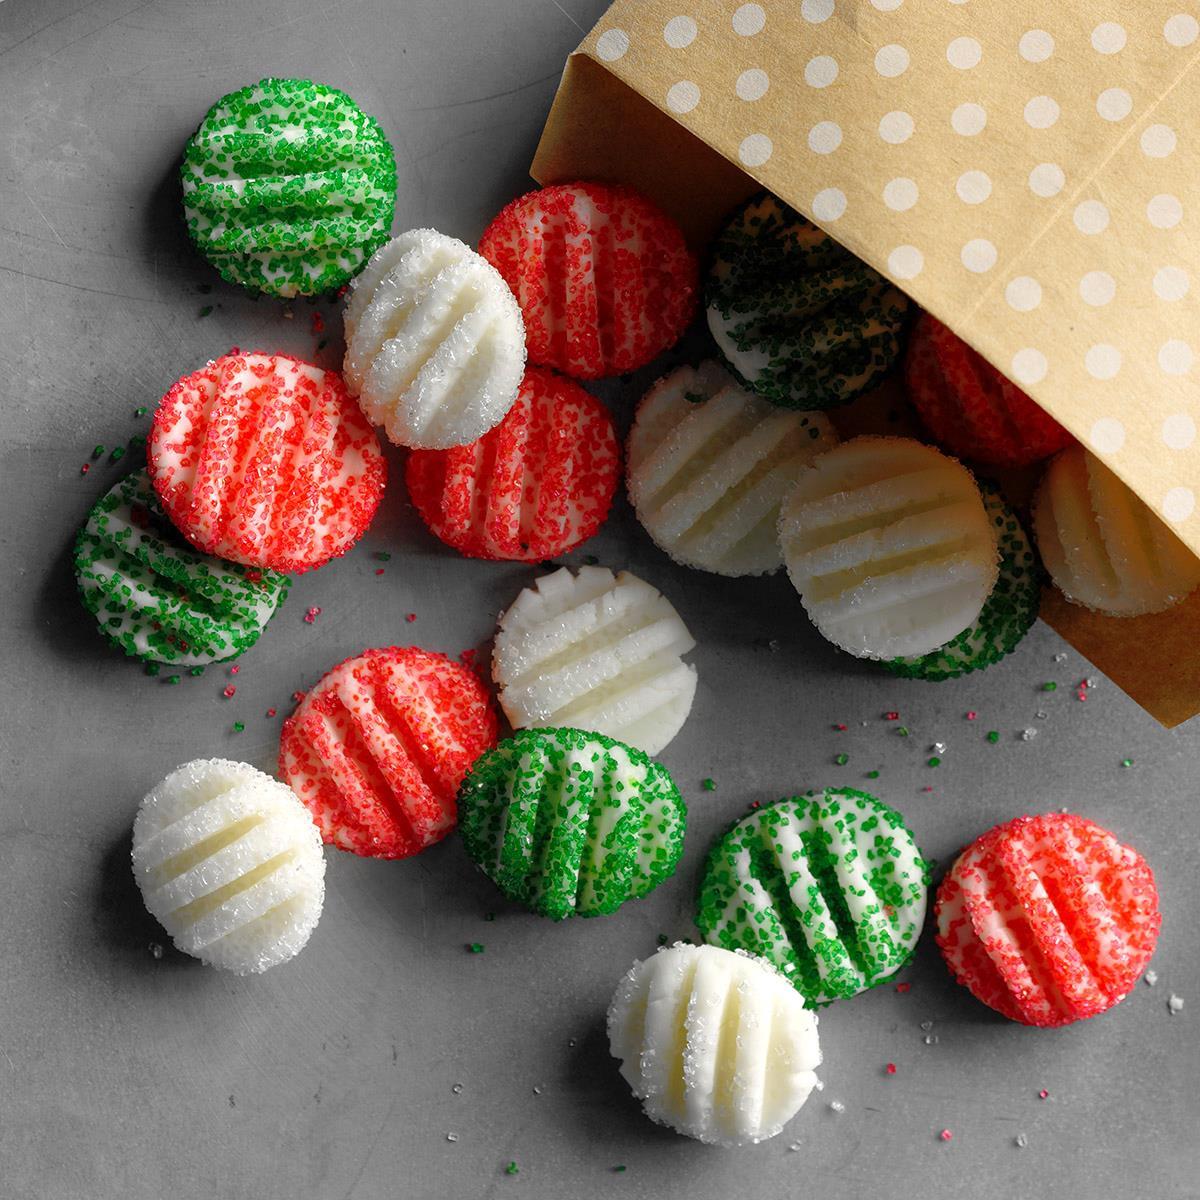 Recipes For Christmas Candy  Top 10 Homemade Christmas Candy Recipes